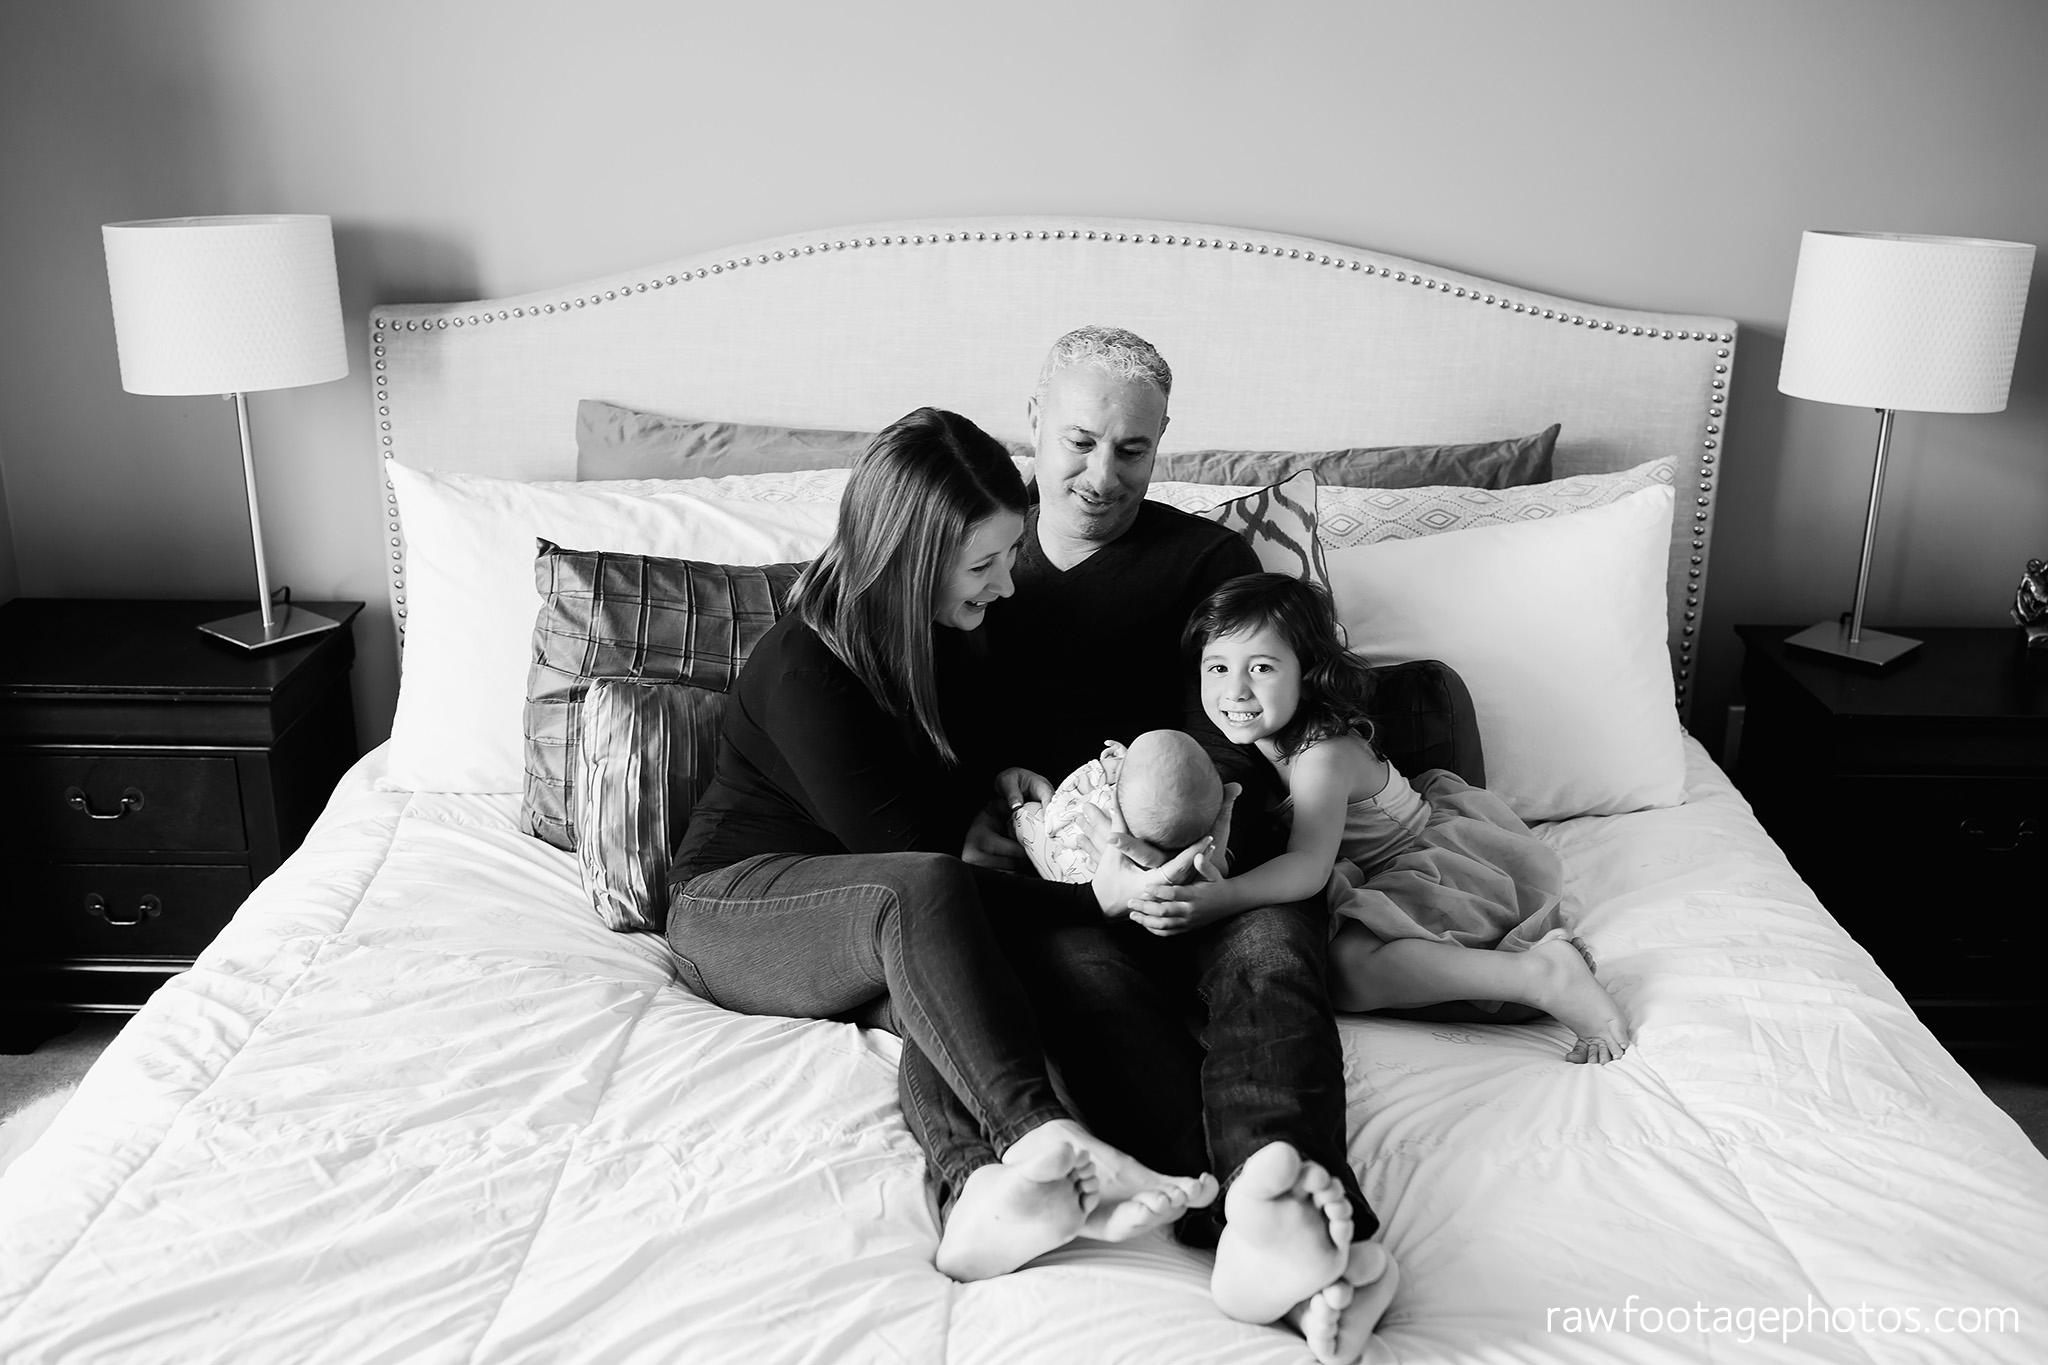 london_ontario_newborn_lifestyle_photographer-baby_nate-raw_footage_photography008.jpg